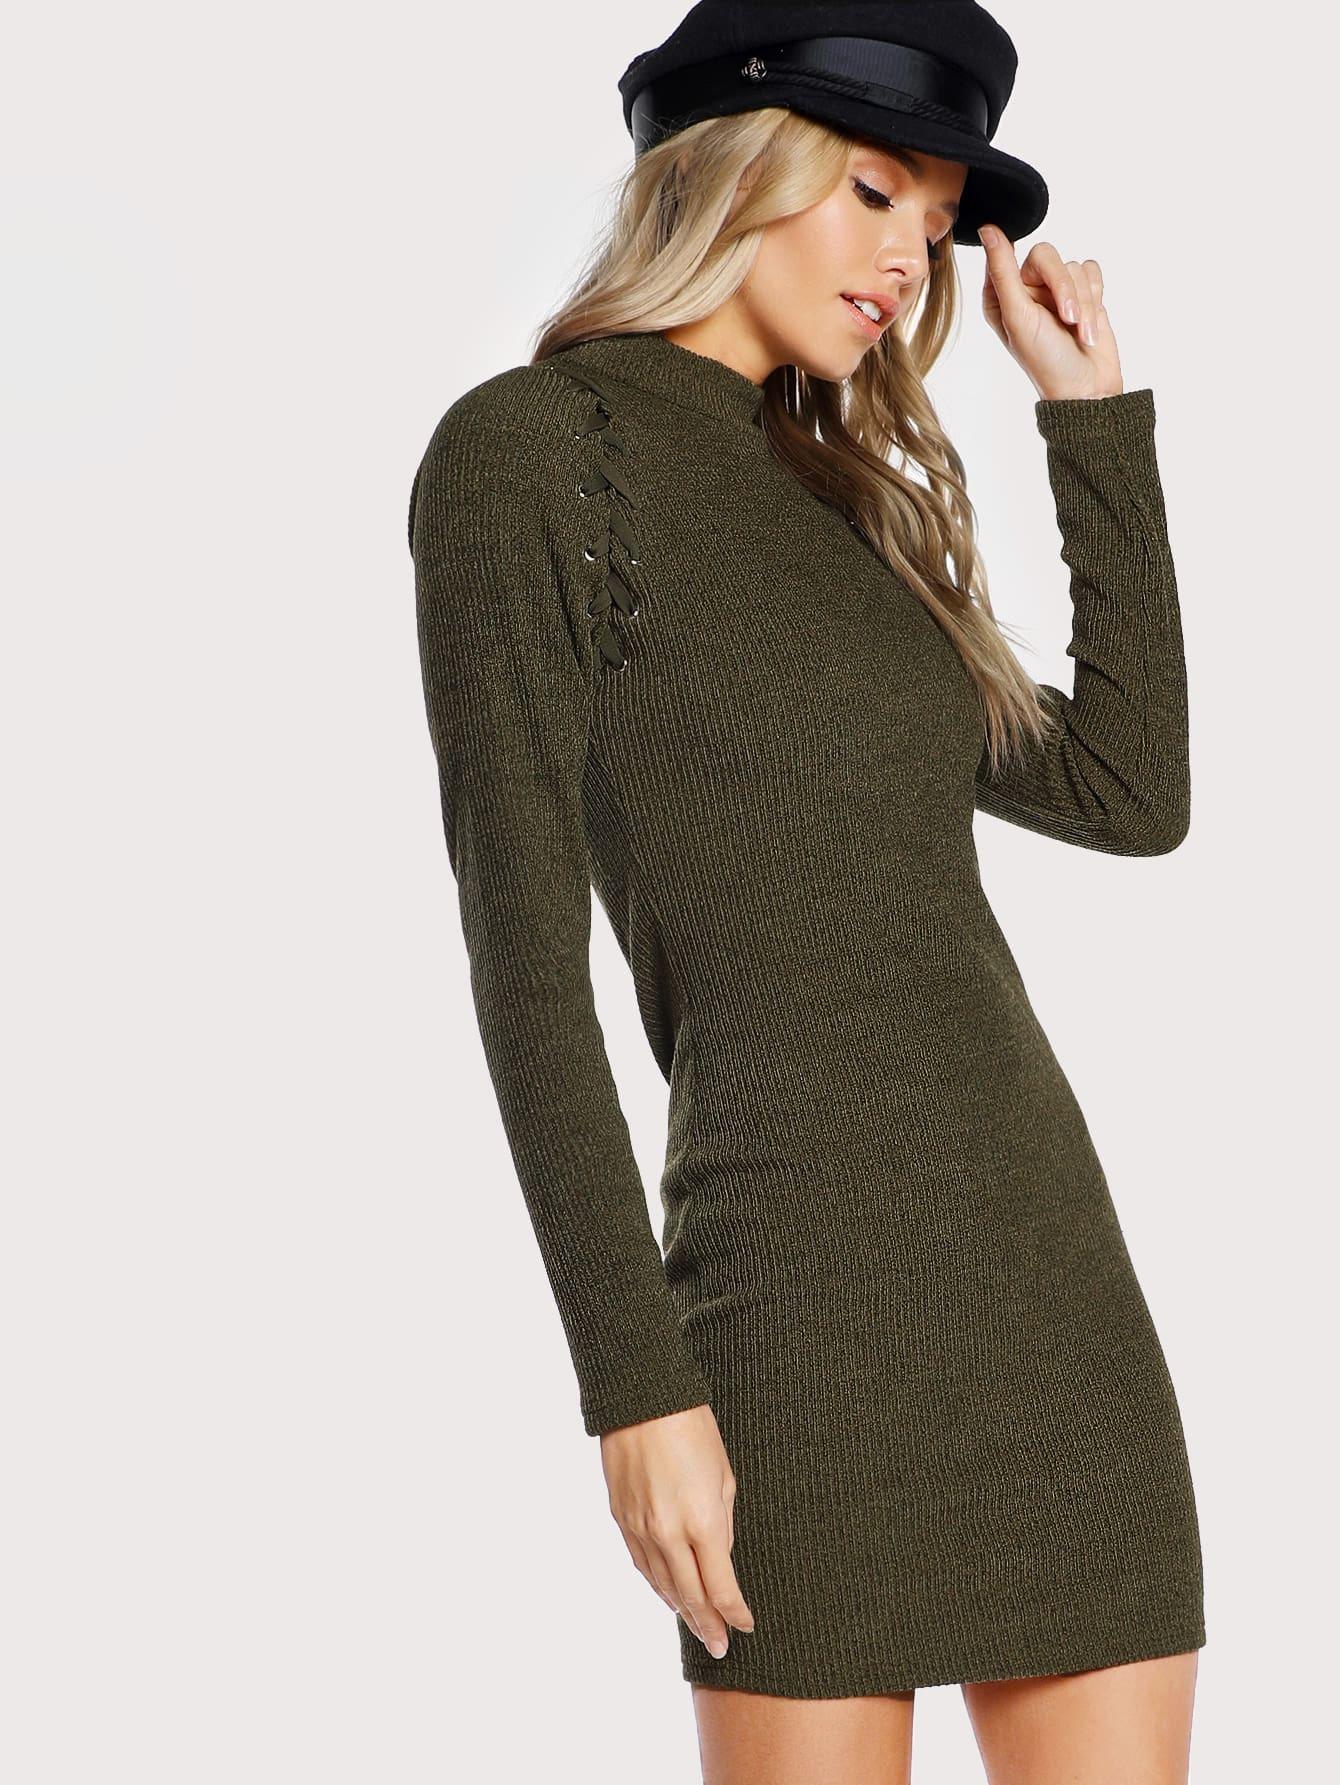 Mock Neck Lace Up Rib Knit Dress dressmmc170927705